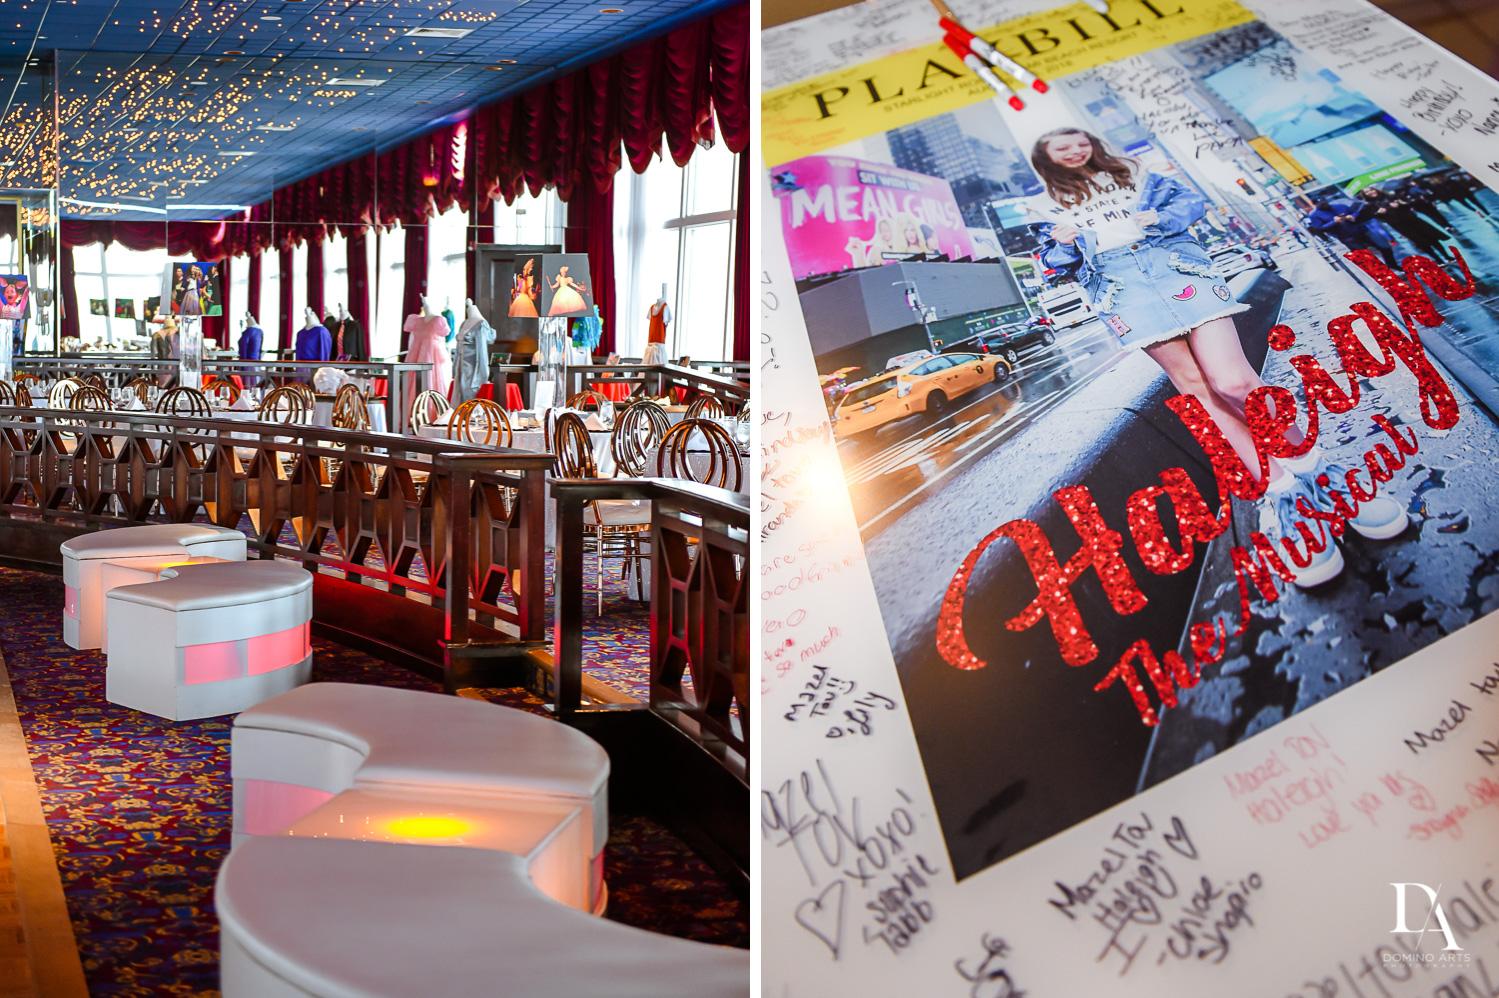 Amazing Decor at Broadway Theme Bat Mitzvah Photography at Miami Beach Resort